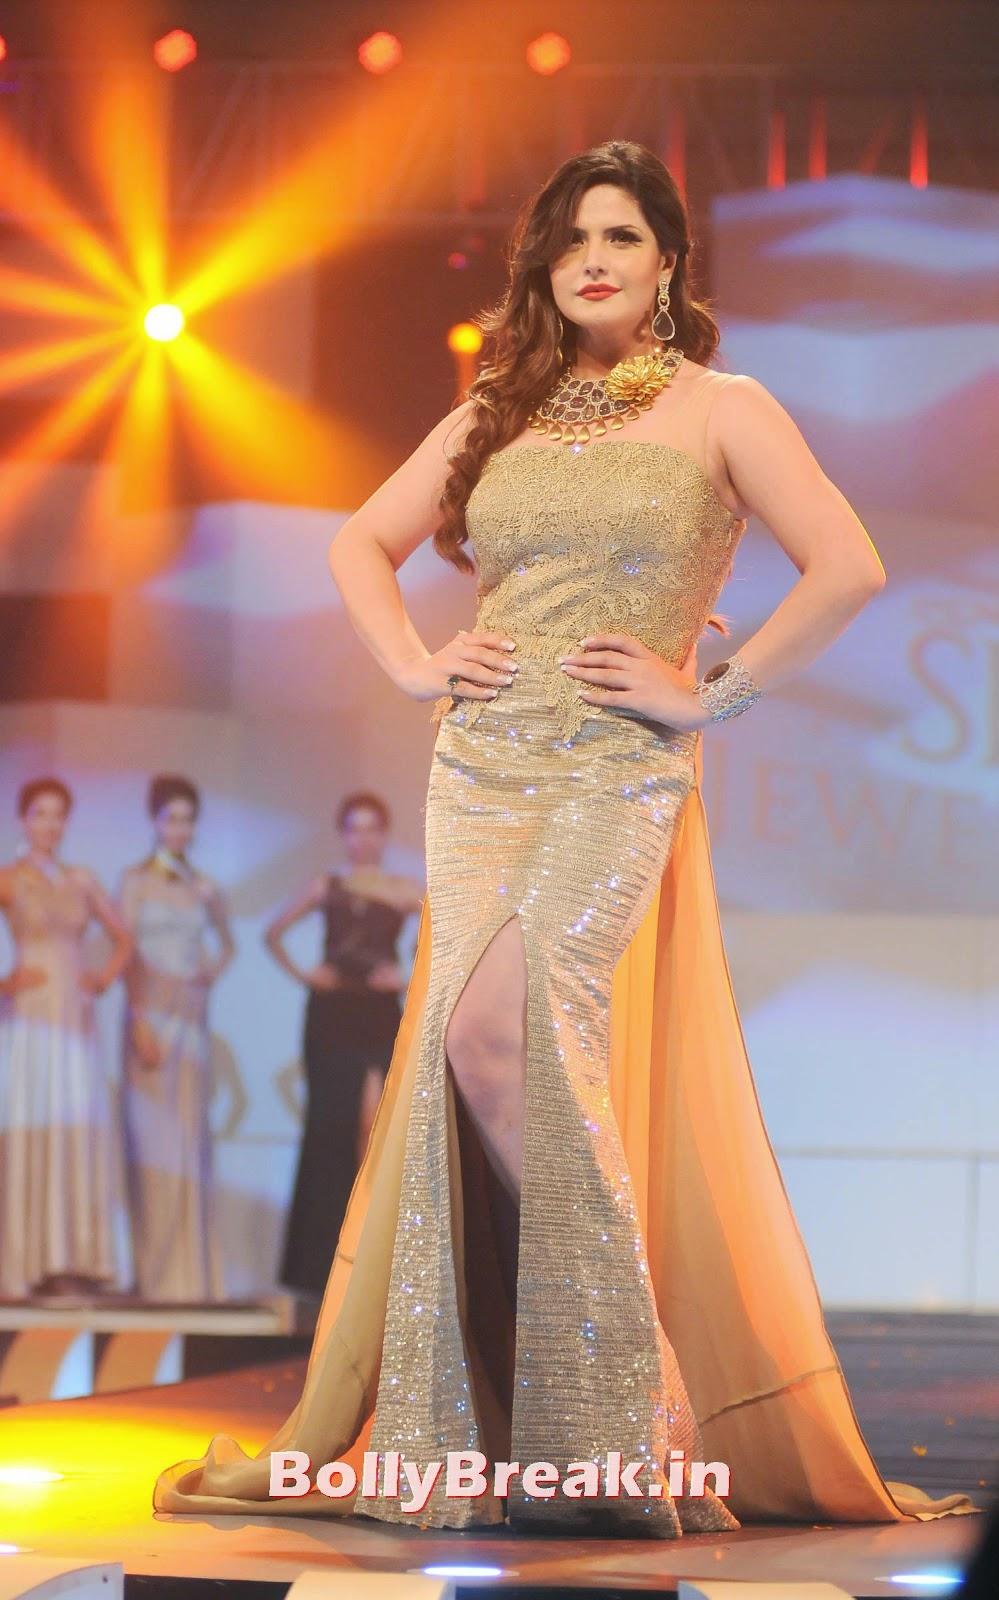 , Zarine Khan in Golden Gown Dress at IBJA Fashion Show